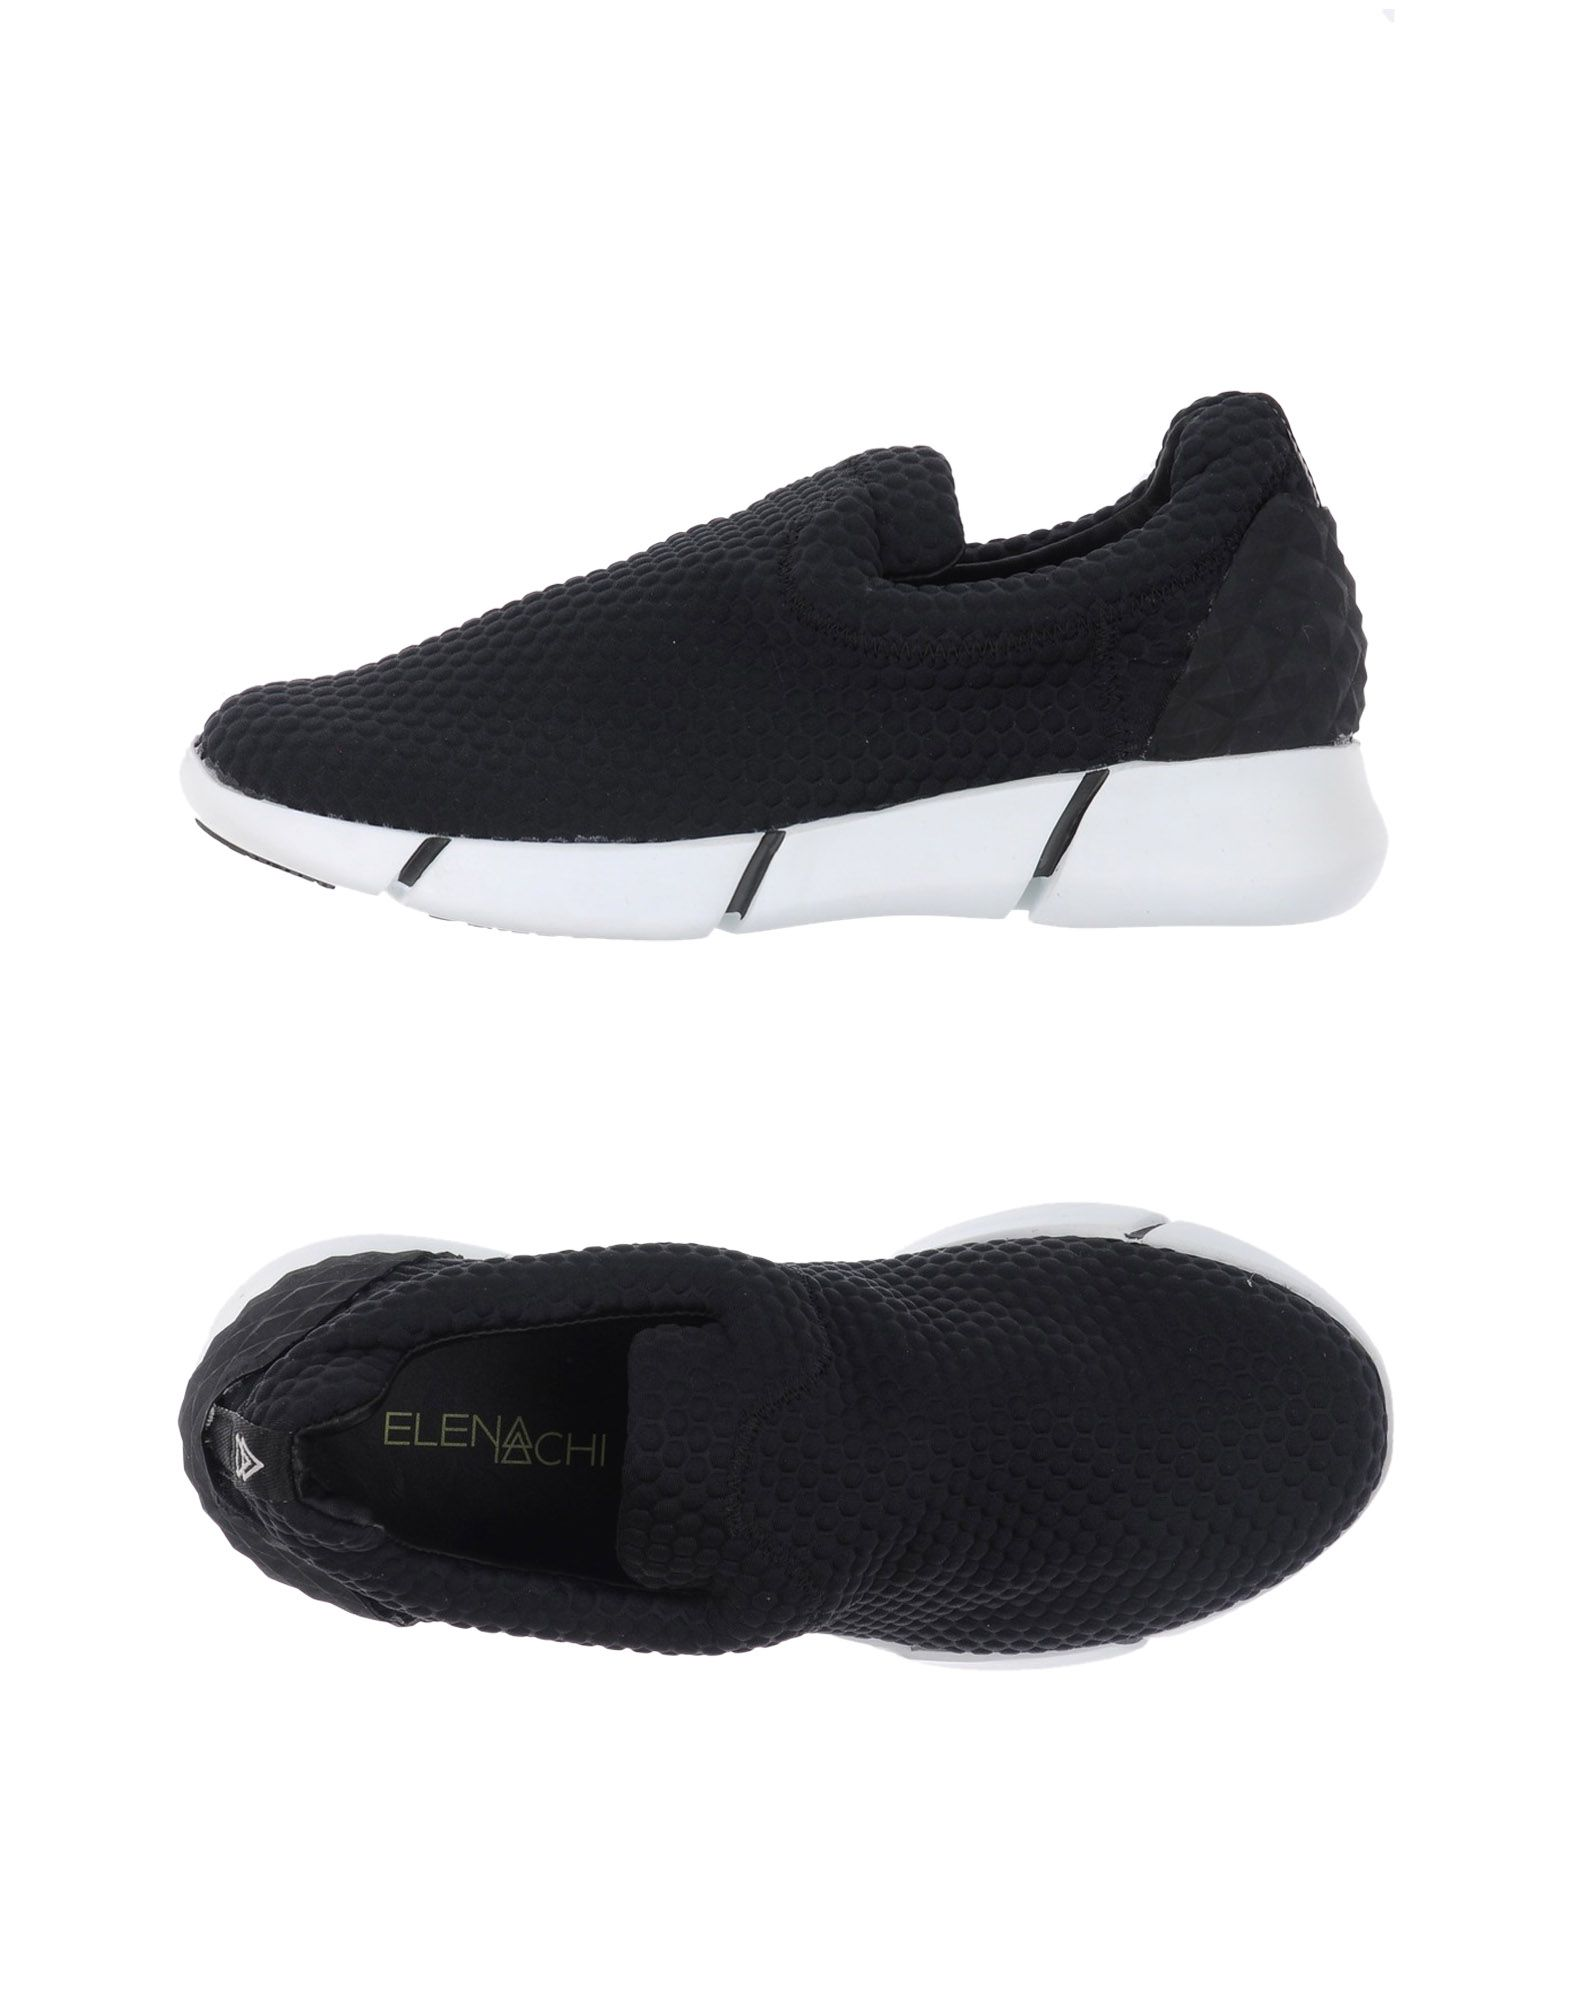 Elena Damen Iachi Sneakers Damen Elena  11241964NI Gute Qualität beliebte Schuhe fec1e2